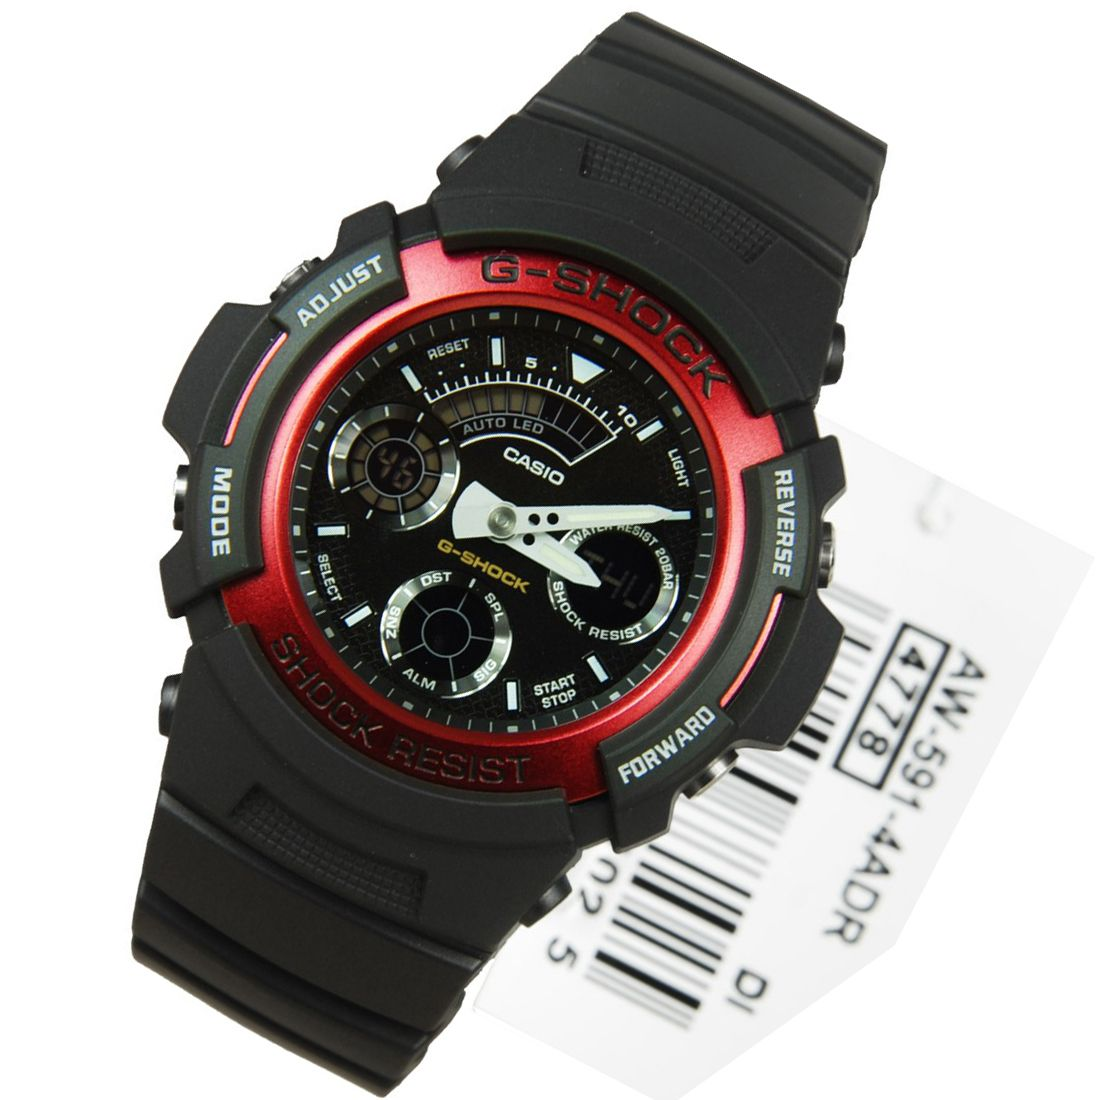 Casio G Shock Aw 591 4adr 4a Mens Sports Watch Attainable Gshock Original Gw 9400bj 1jf A Watchescom